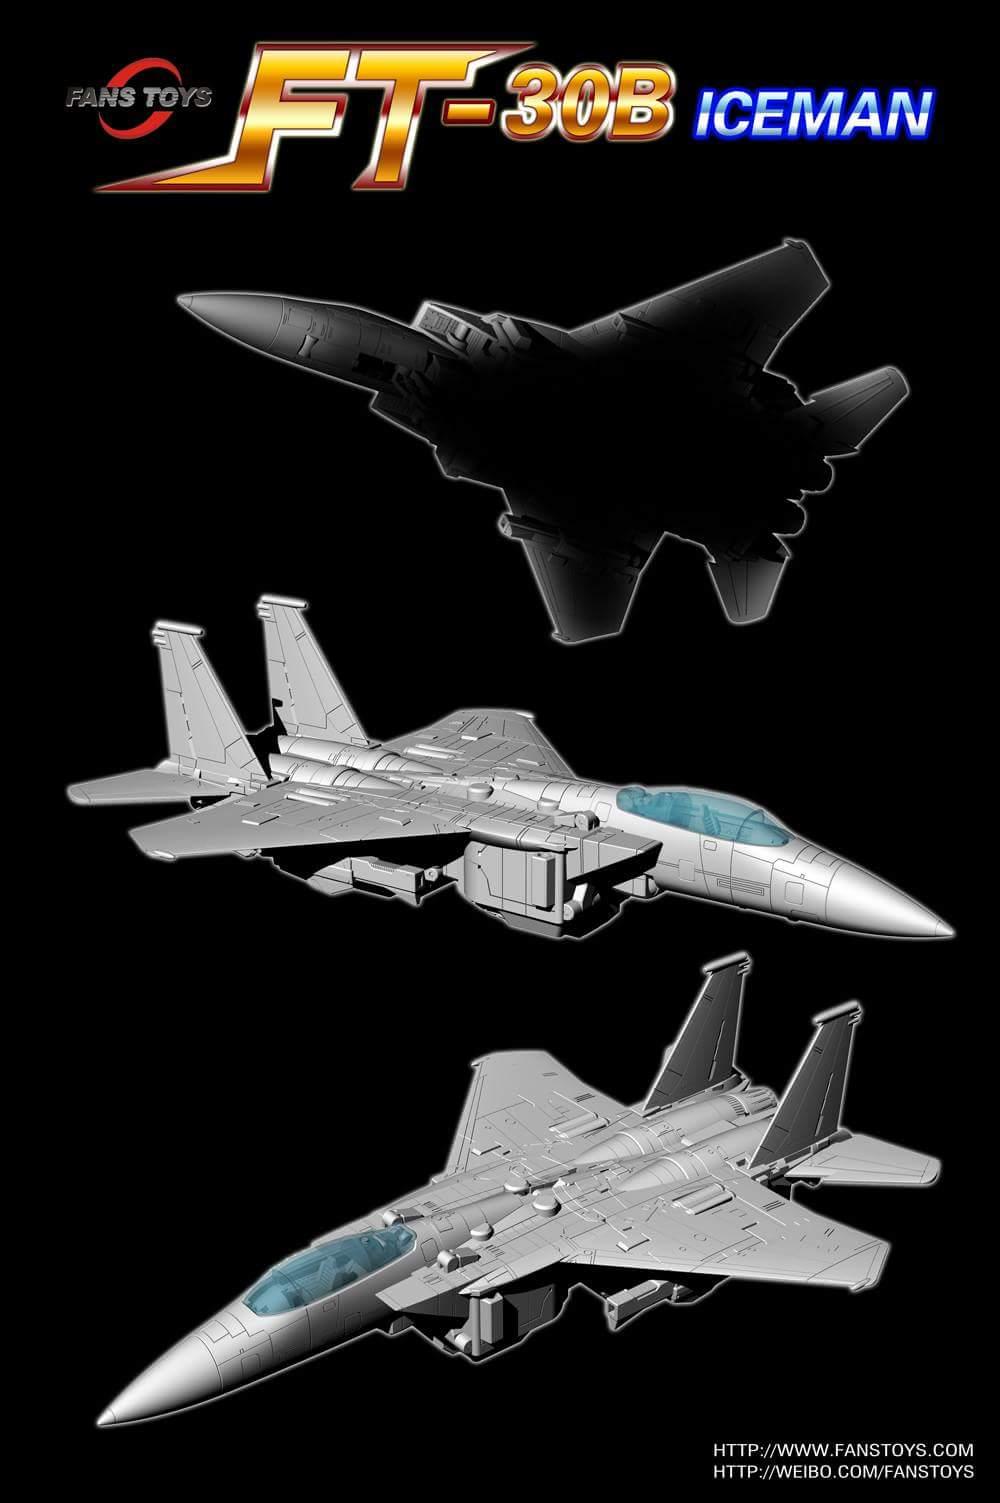 [Fanstoys] Produit Tiers - Jouet FT-30 Ethereaon (FT-30A à FT-30E) - aka Superion ZFDBRxal_o